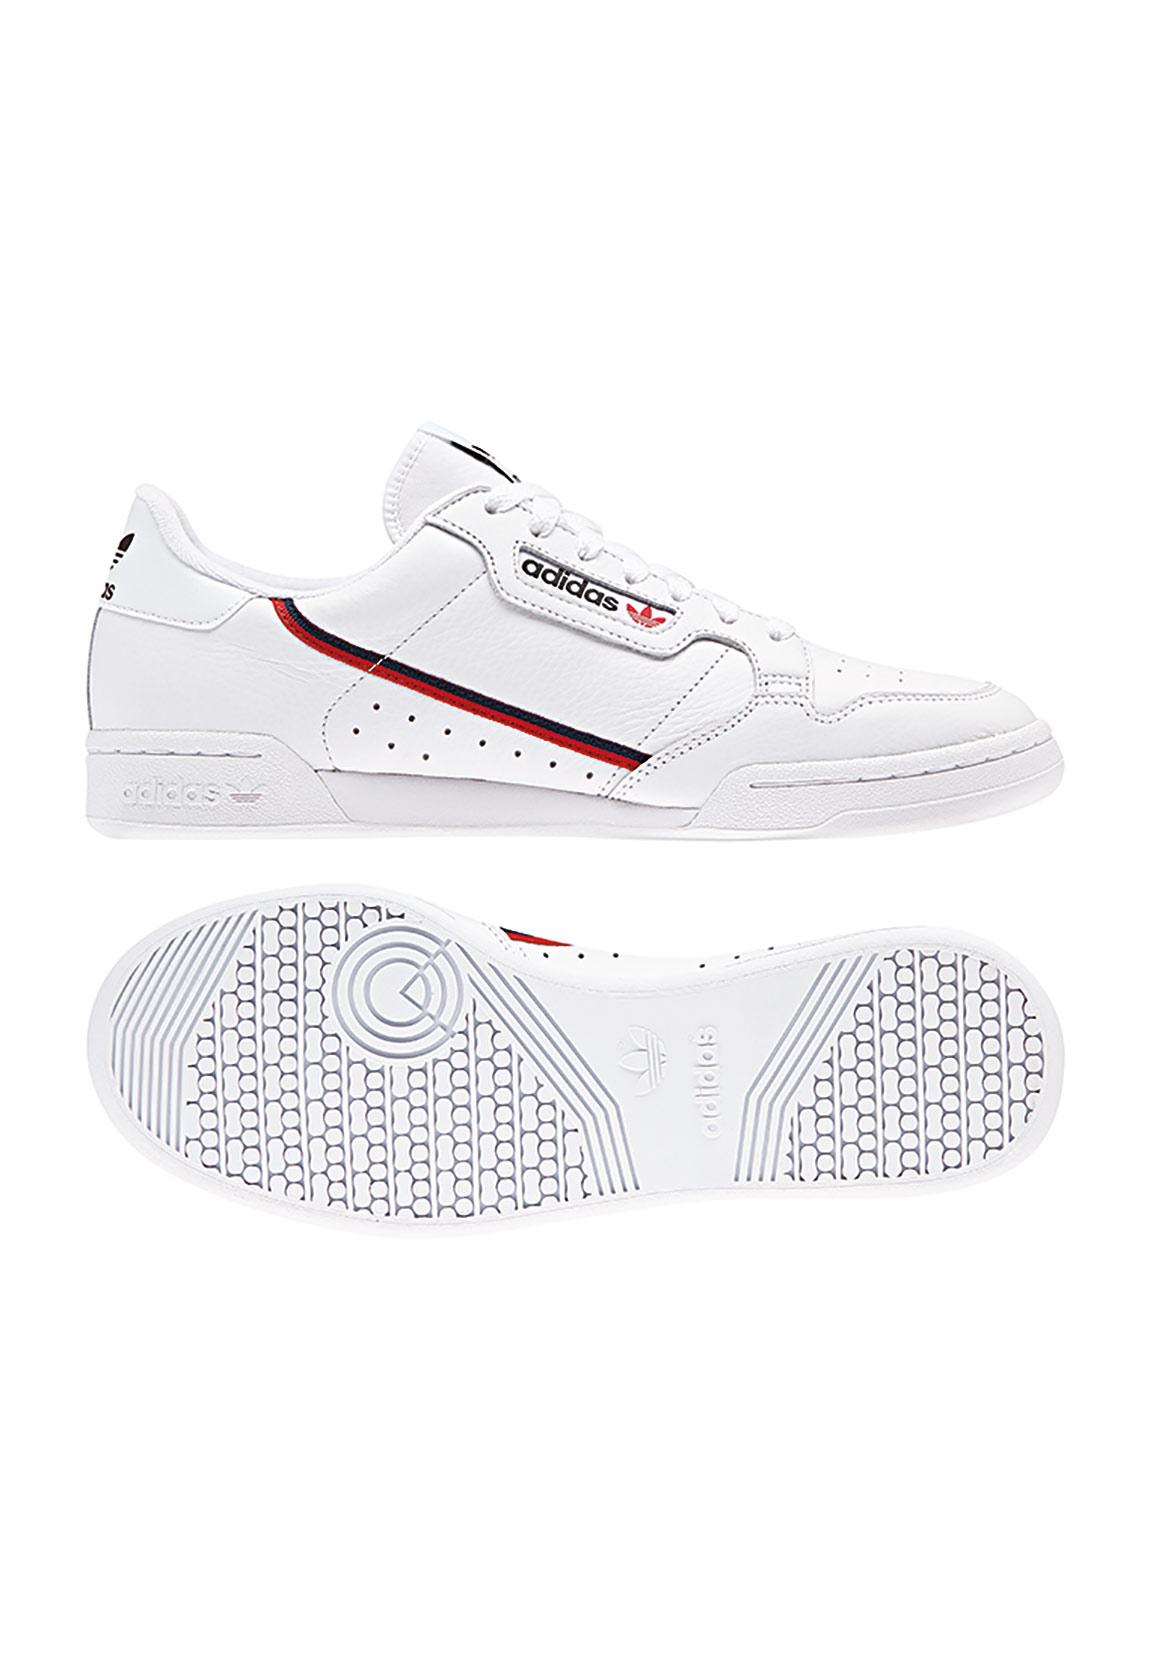 sports shoes 6f7f4 22fa0 adidas Originals Sneaker Continental 80 B41674 Weiß - rvolz.